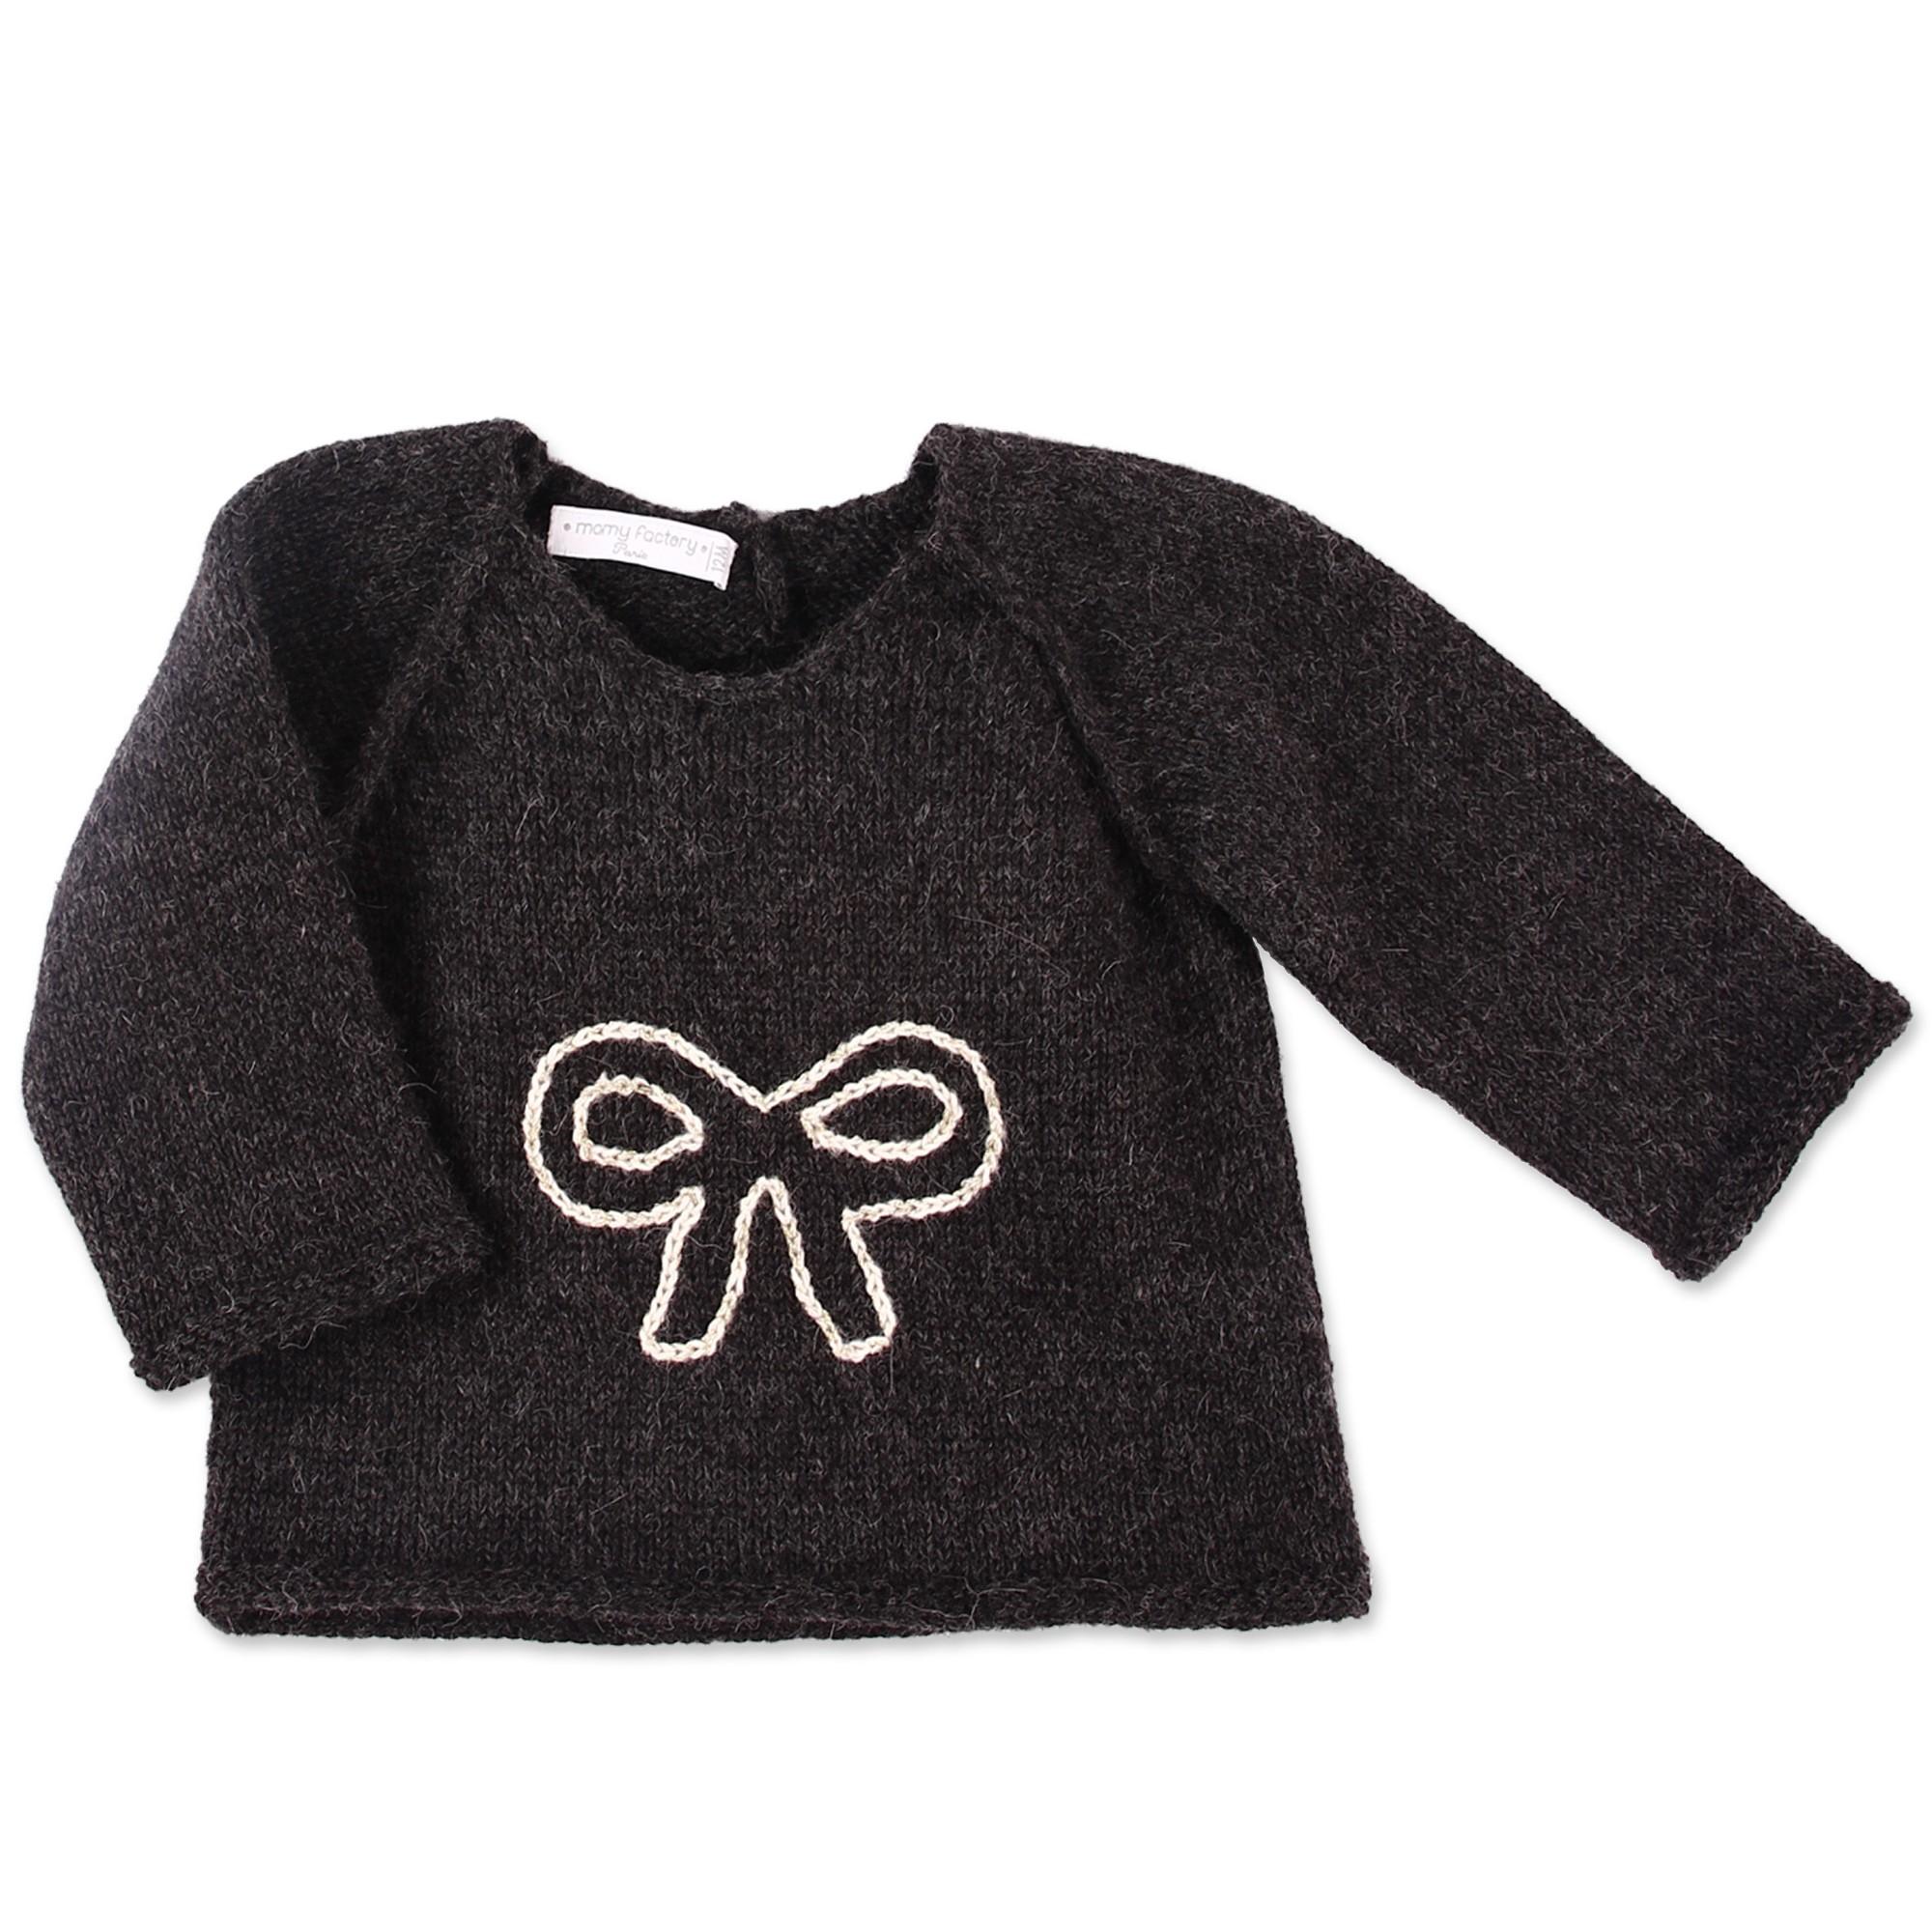 les tricots de mamy pull b b fille anthracite tricot. Black Bedroom Furniture Sets. Home Design Ideas